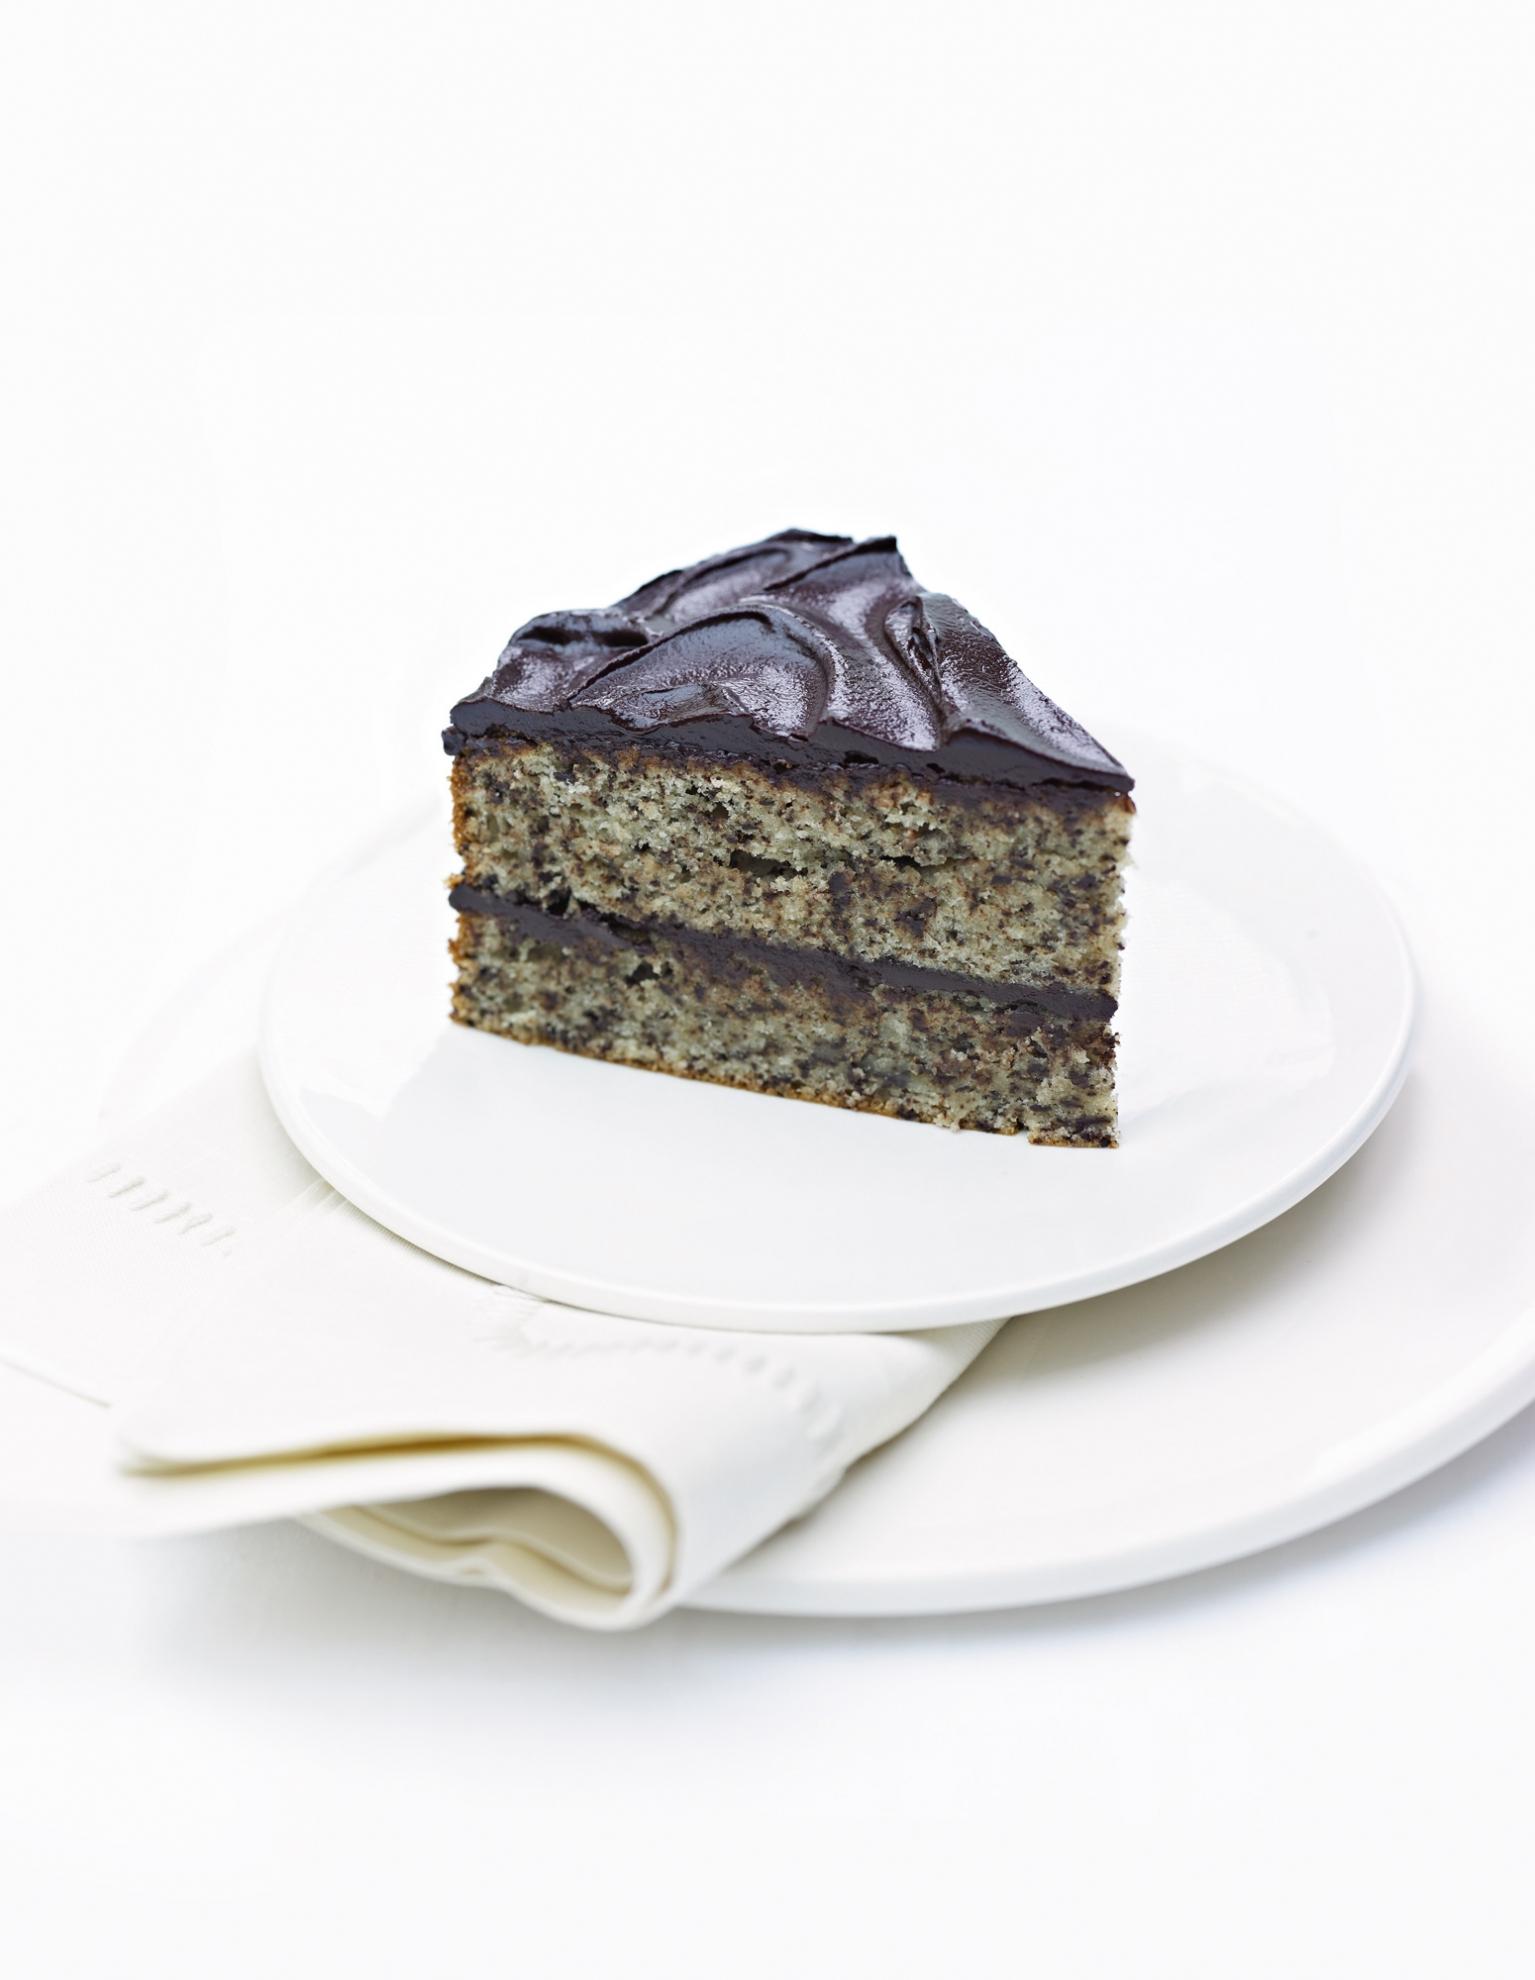 Delia Smith Chocolate Fudge Cake Recipe